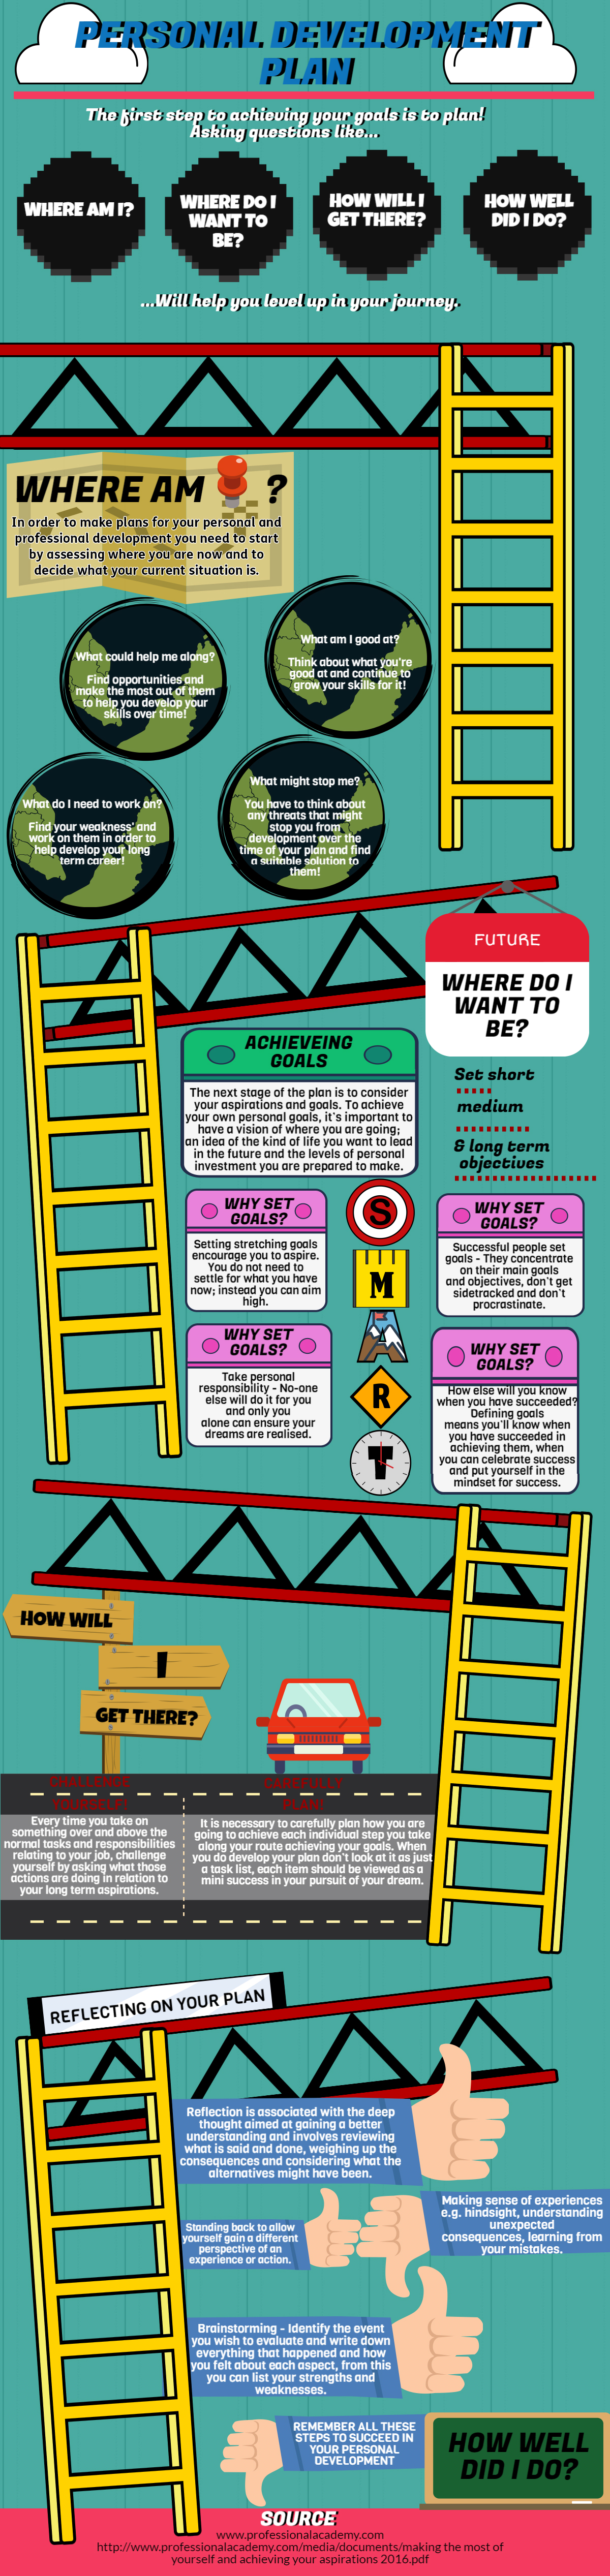 Personal Development Infographic